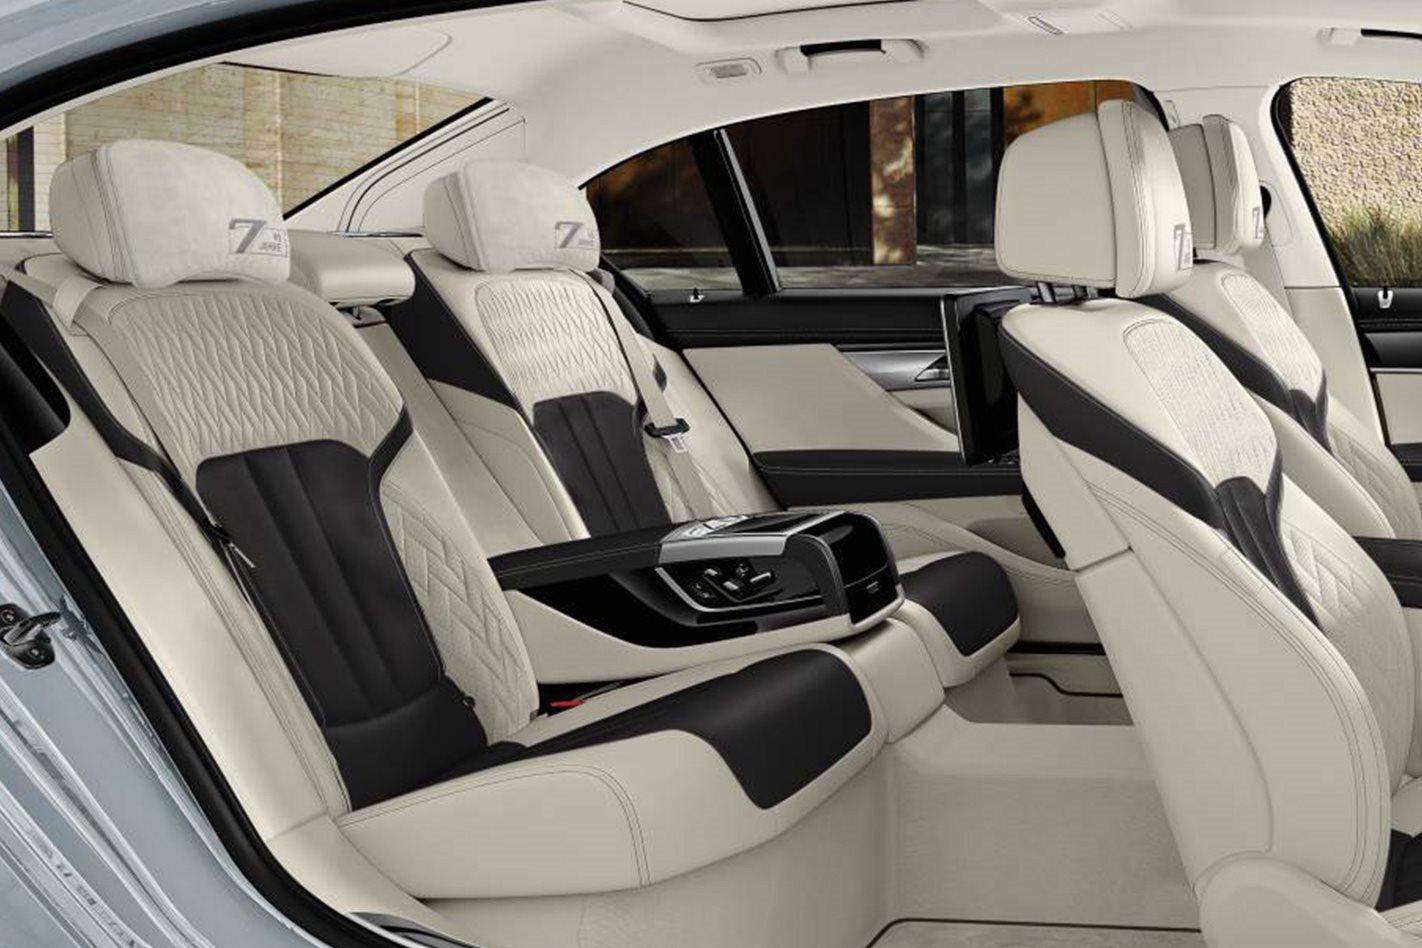 BMW 7 Series 40 Jahre rear seats